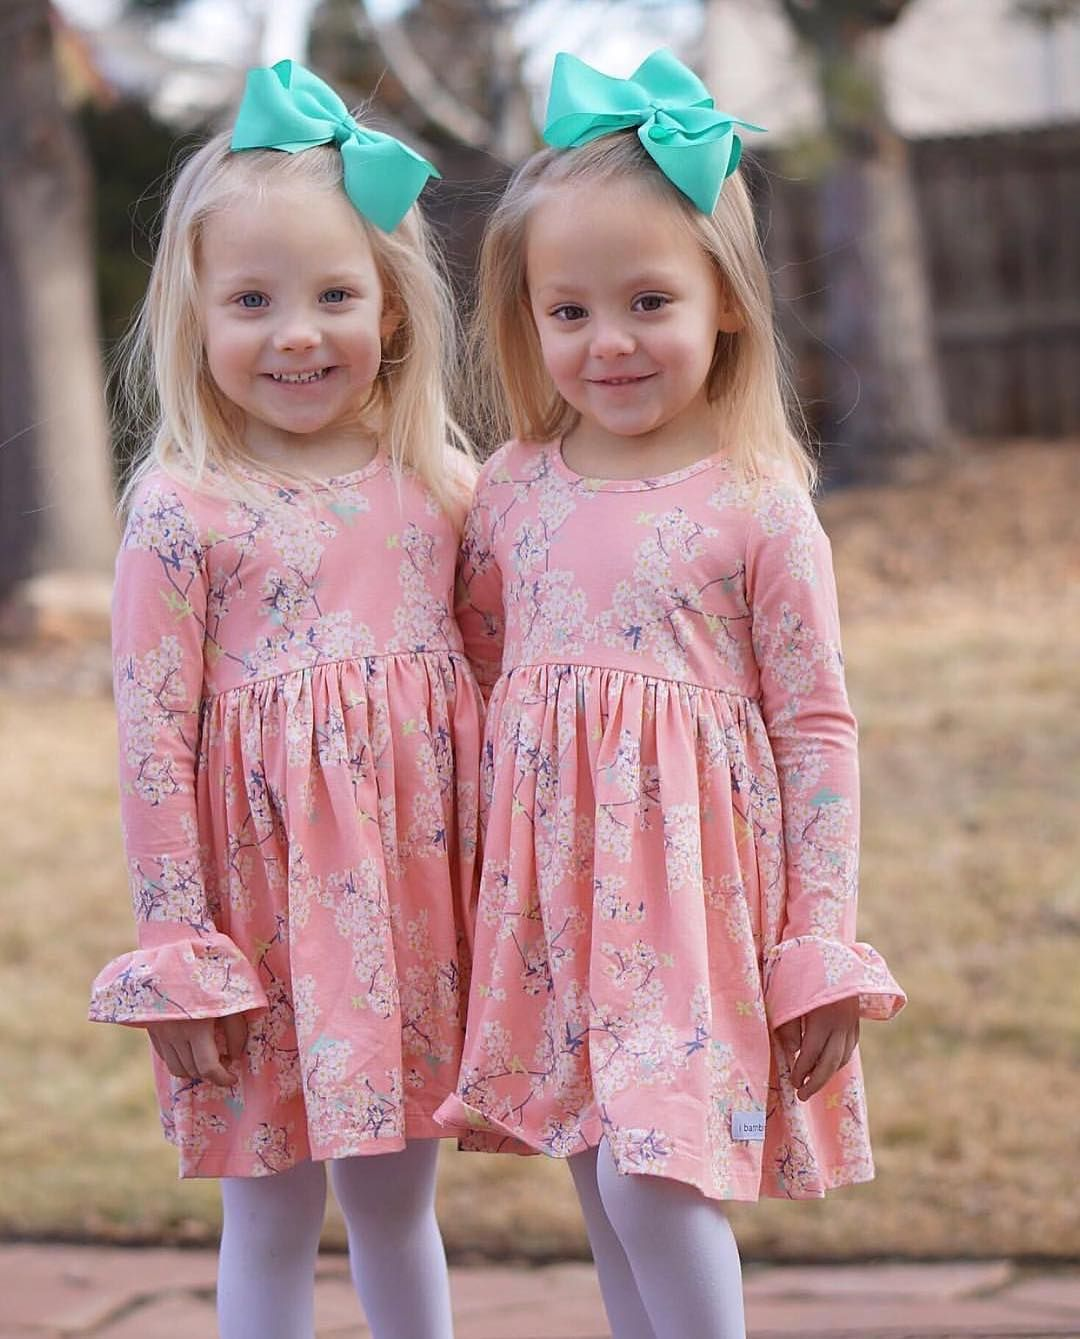 Easter Dress Kids Easter Clothing Pink Ruffle Longsleeve Shirt Fall Fashion For Kids Fall Styles F Easter Outfit For Girls Kids Fashion Fall Kids Dress [ 1339 x 1080 Pixel ]